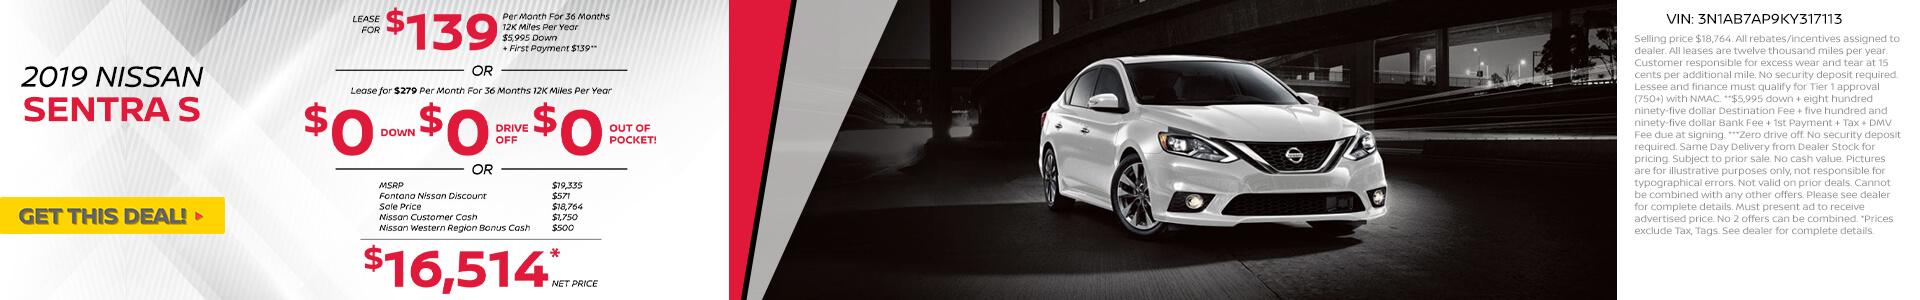 Nissan Sentra $139 Lease